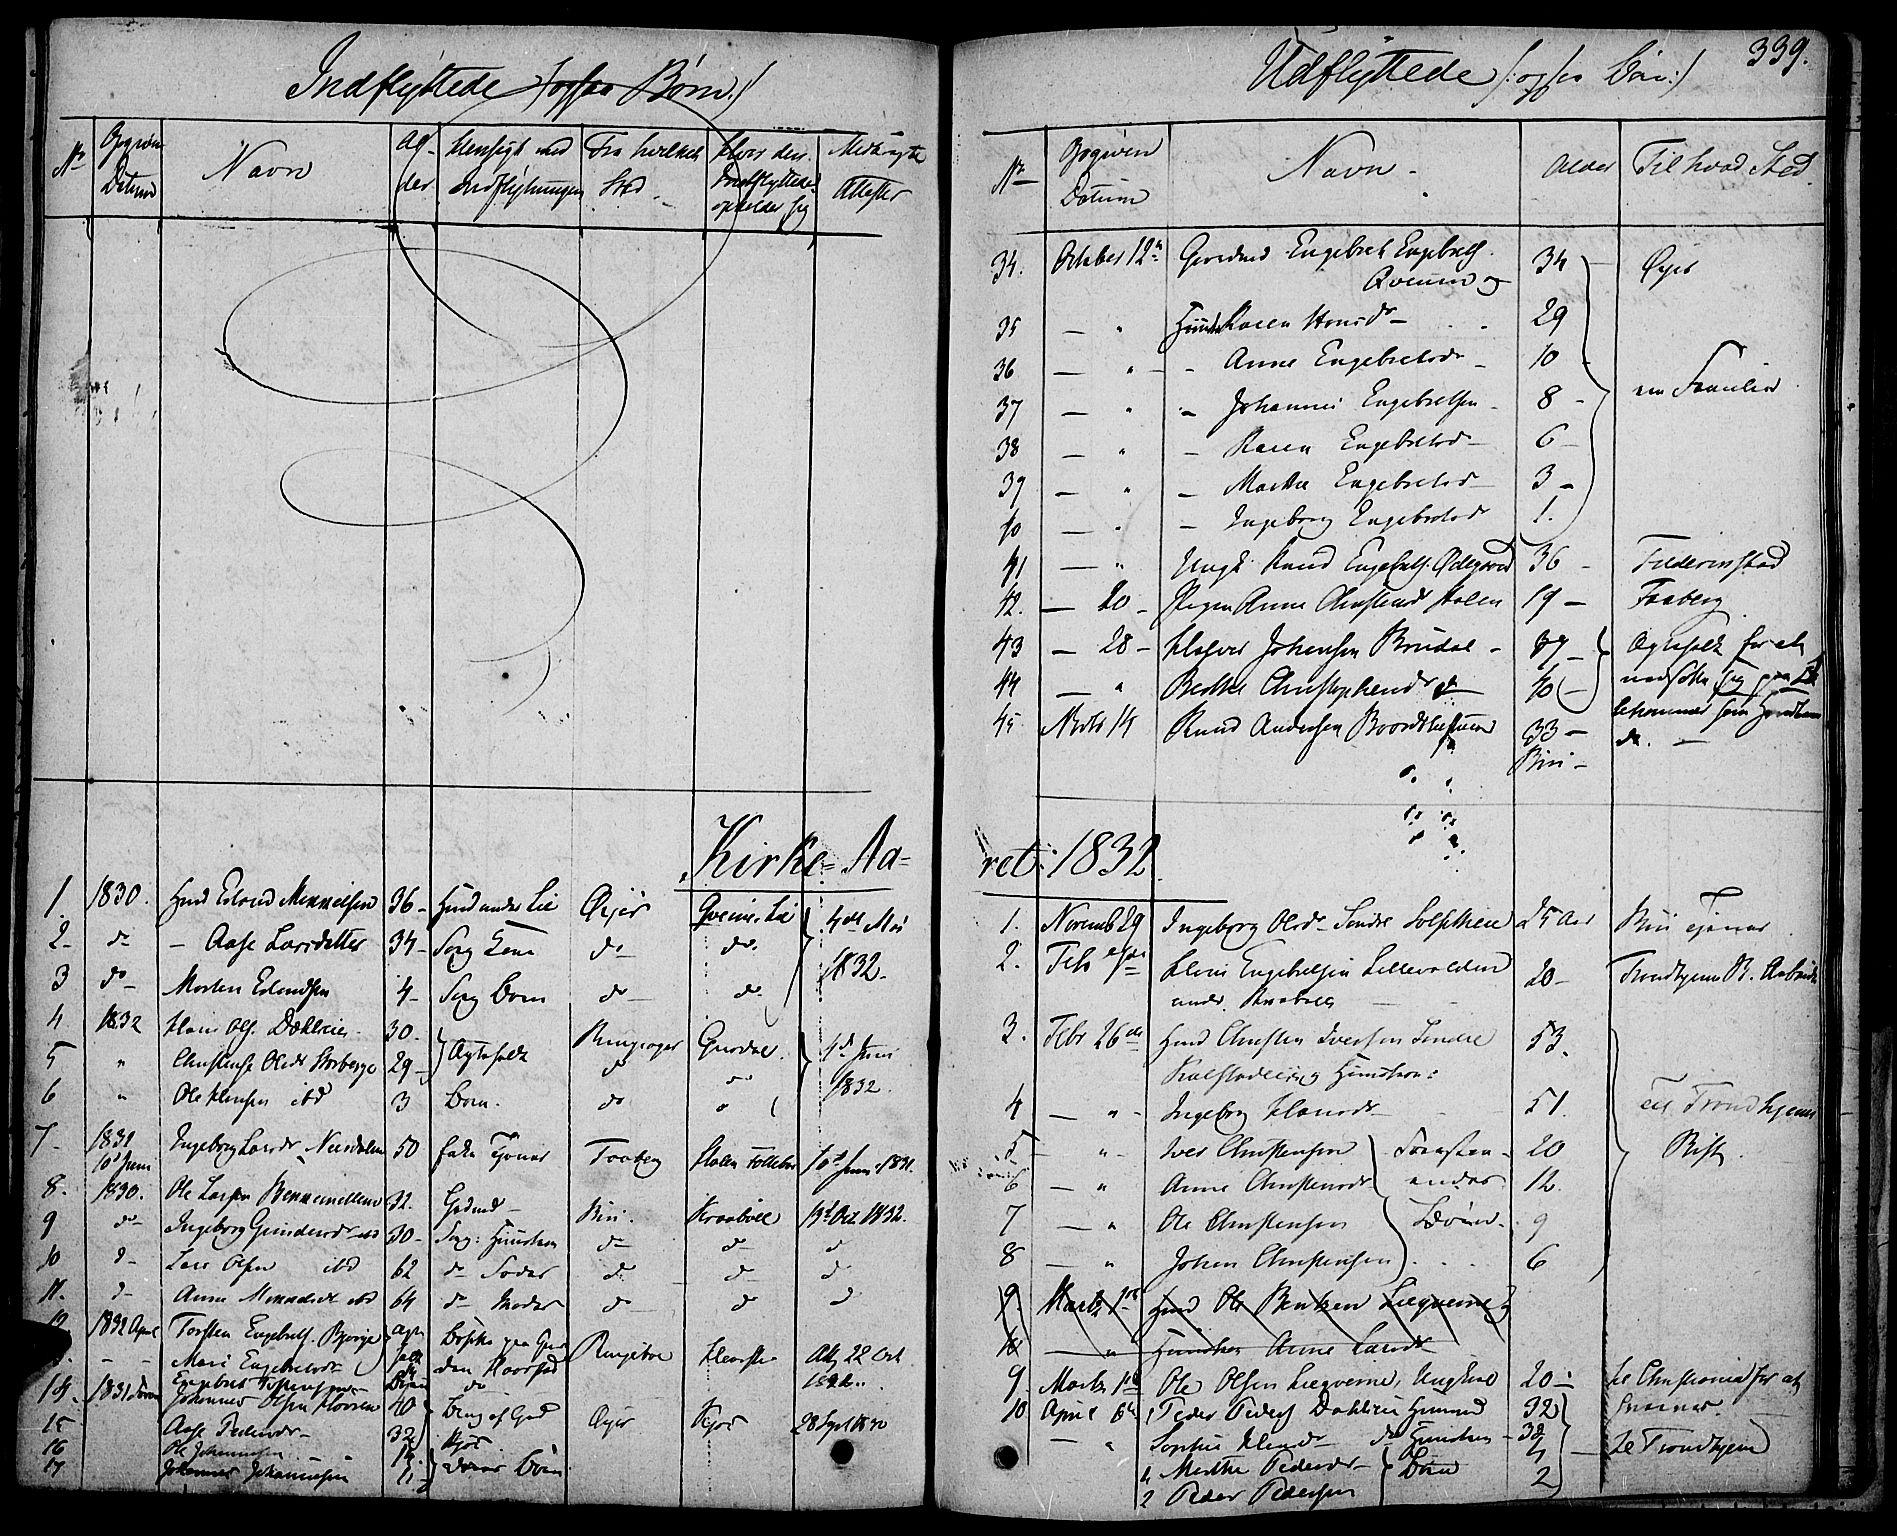 SAH, Gausdal prestekontor, Ministerialbok nr. 6, 1830-1839, s. 339